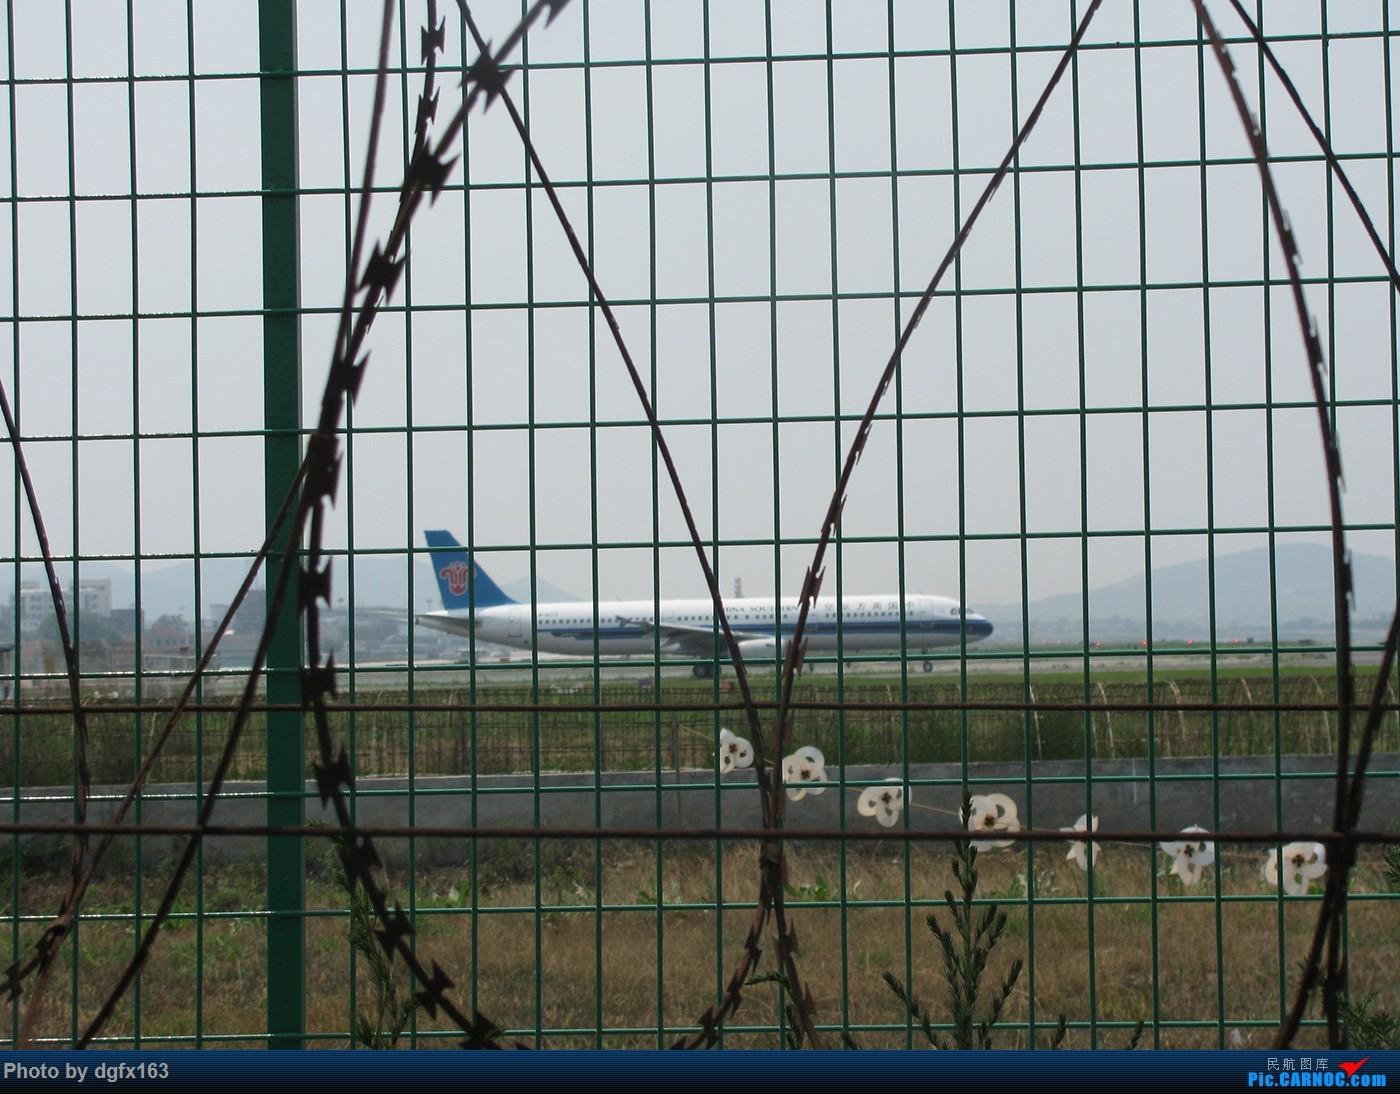 Re:[原创]【dgfx163的拍机(1)大连周水子DLC,烈日拍机1小时半。全日空、日本航空、大韩。。。还不错 AIRBUS A321-200 B-6306 中国大连周水子国际机场